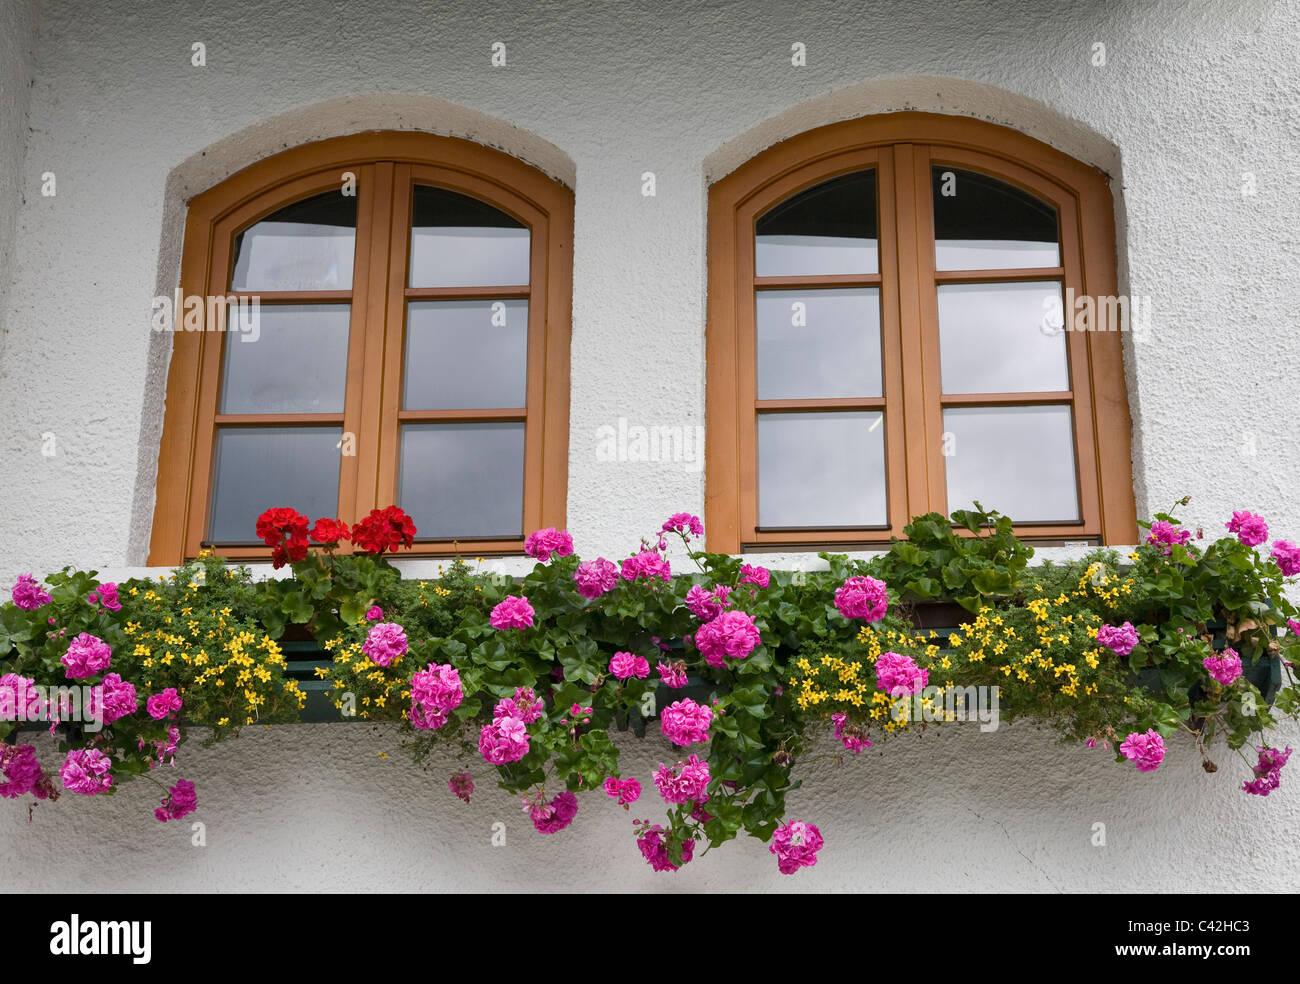 Windows and flower box in Hallstatt Austria - Stock Image